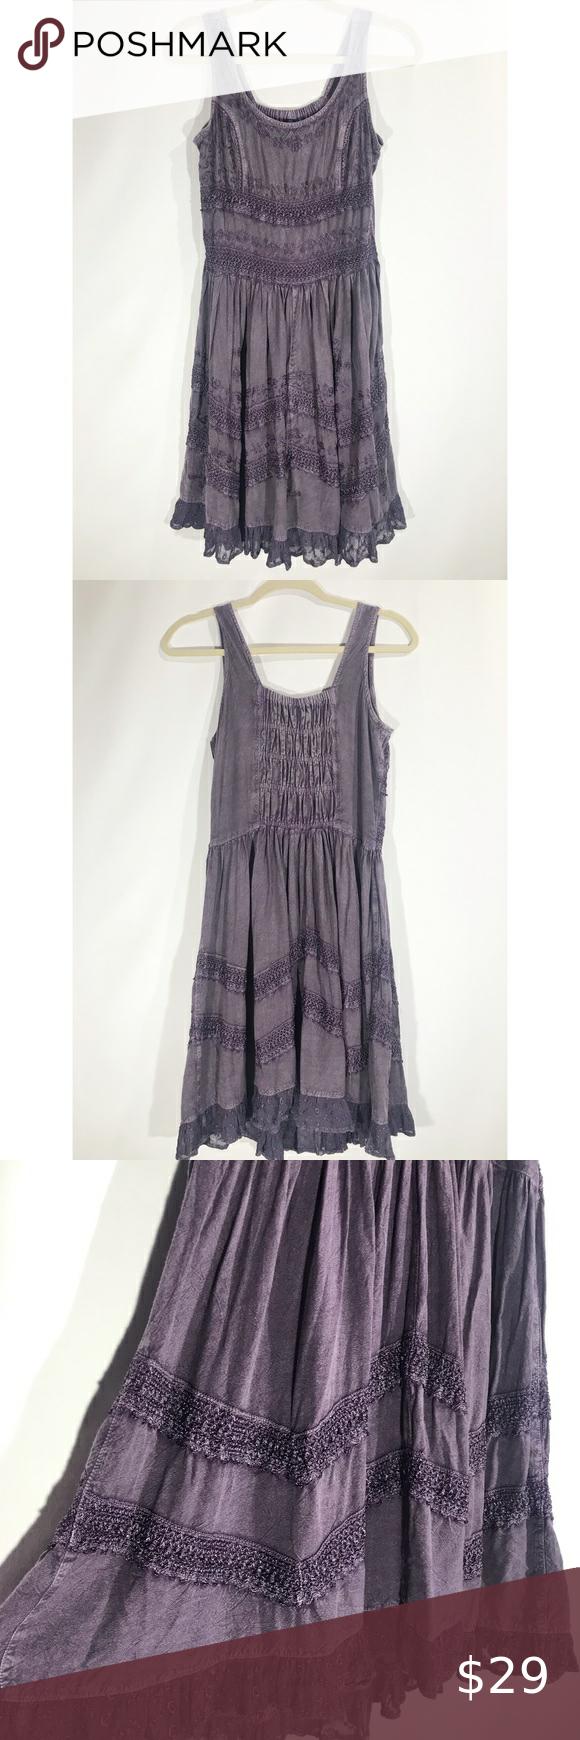 Sacred Threads Purple Embroidered Tank Midi Dress Tank Top Midi Dress Dresses Clothes Design [ 1740 x 580 Pixel ]